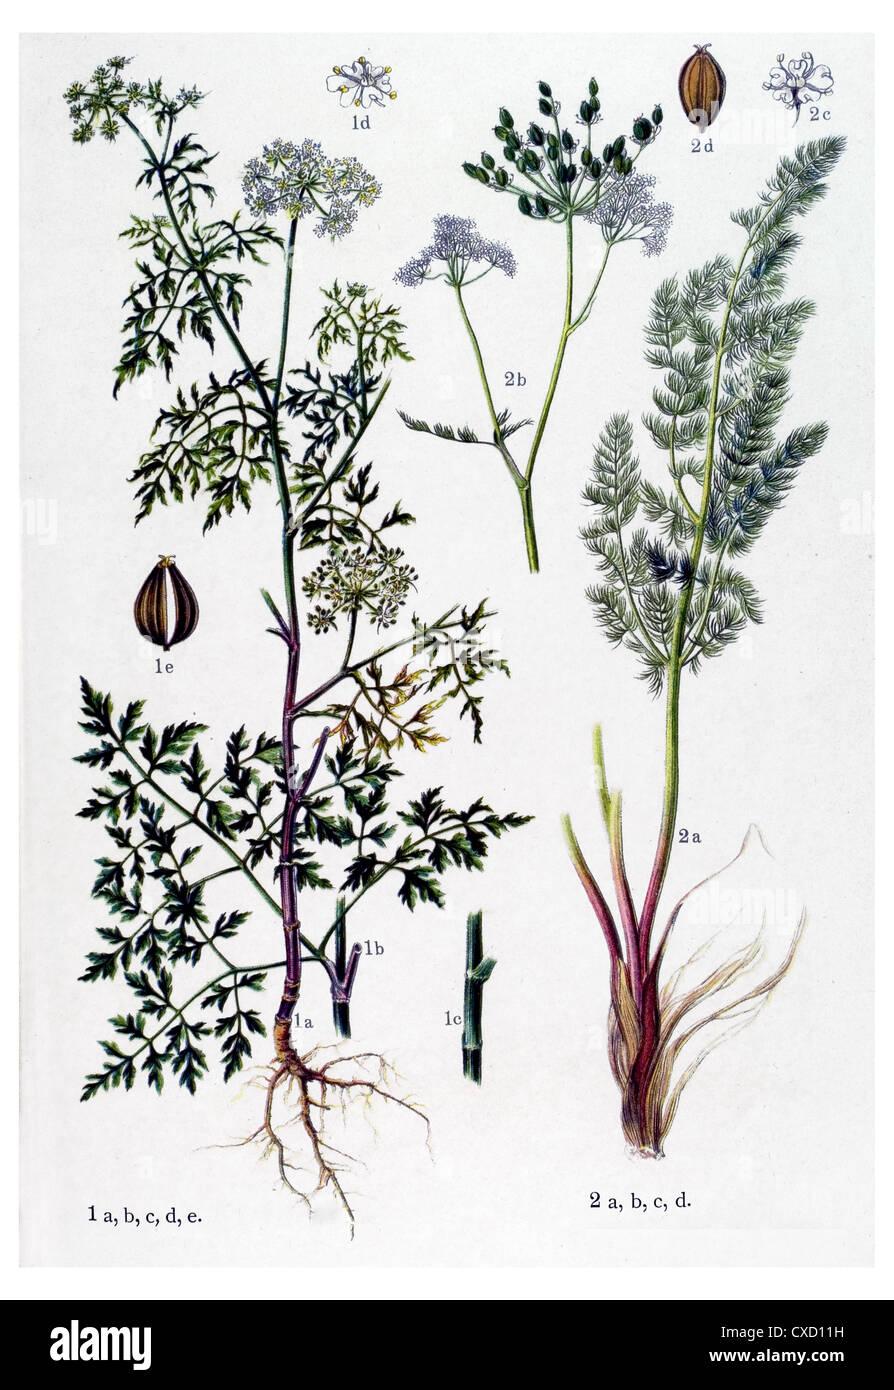 Aethusa cynapium - Stock Image